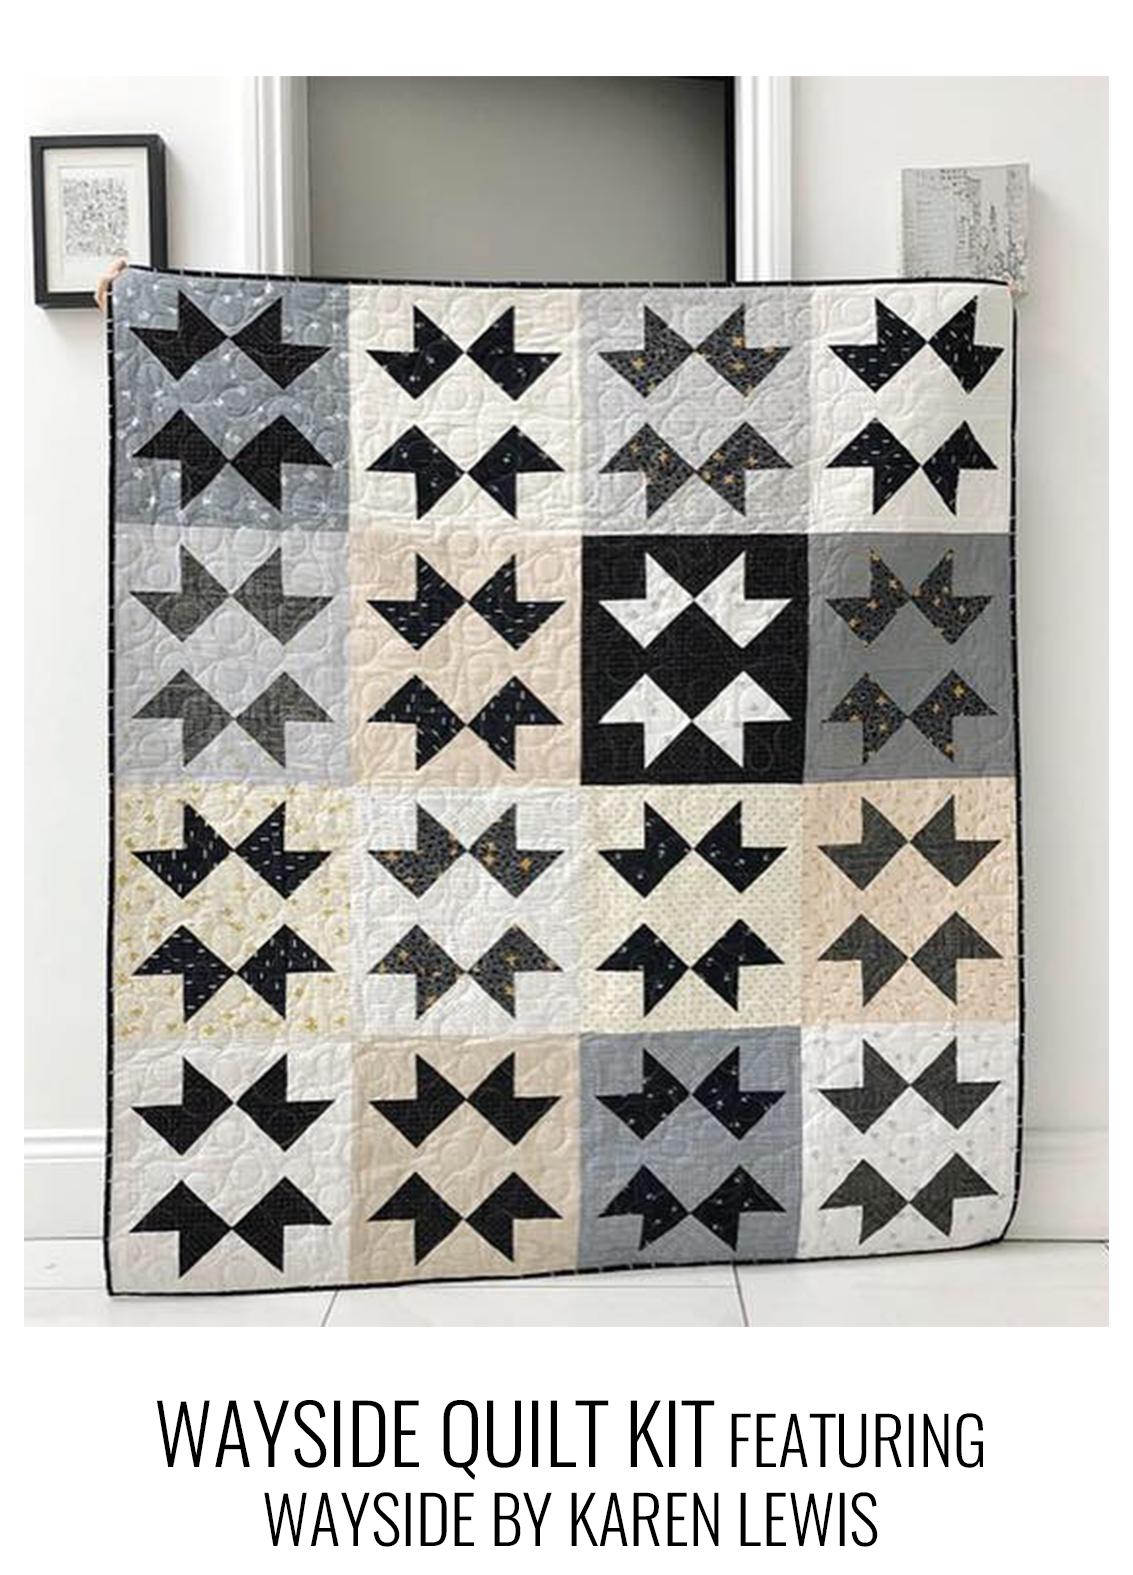 WAYside quilt kit